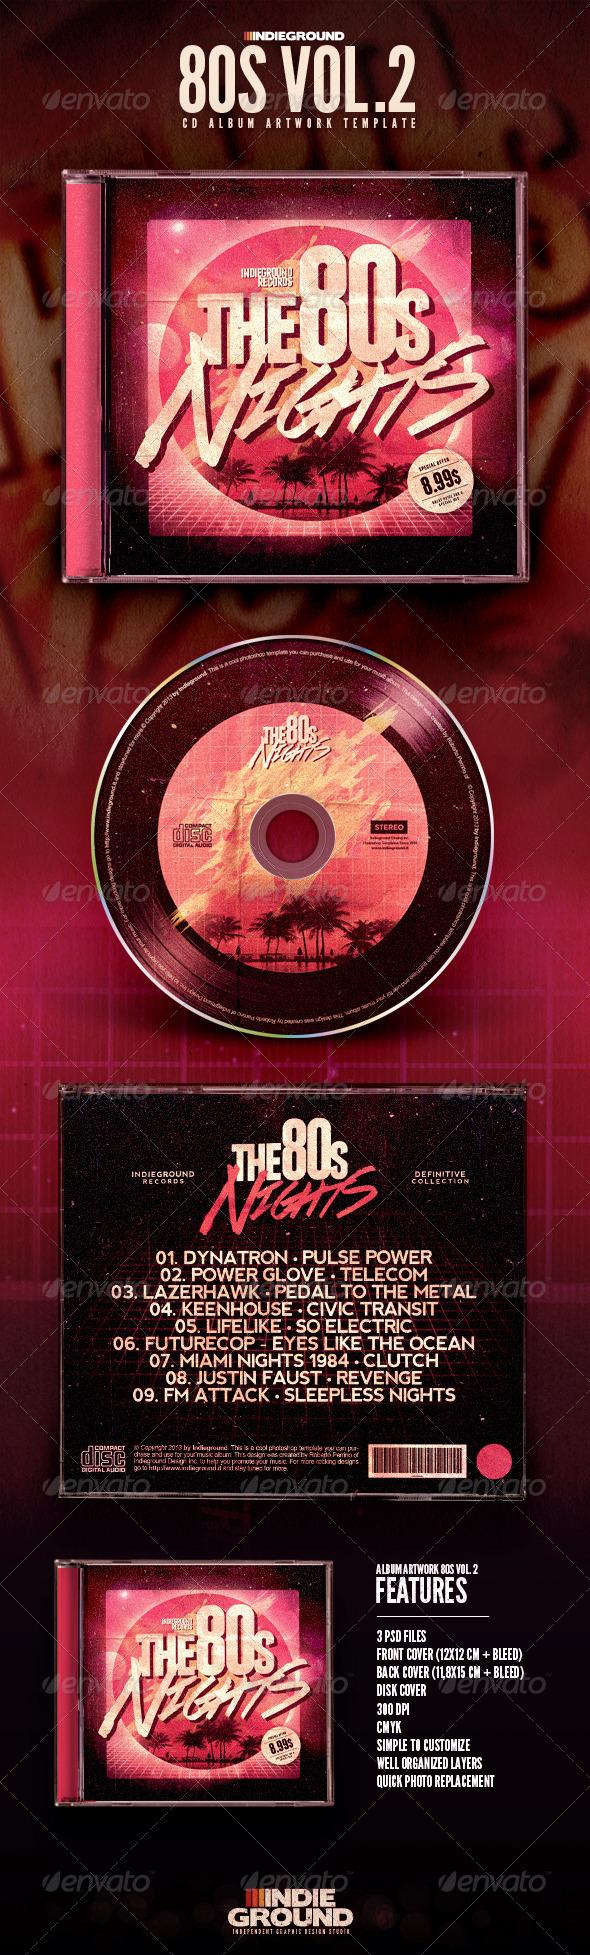 GraphicRiver 80s CD Album Artwork Vol 2 6701480